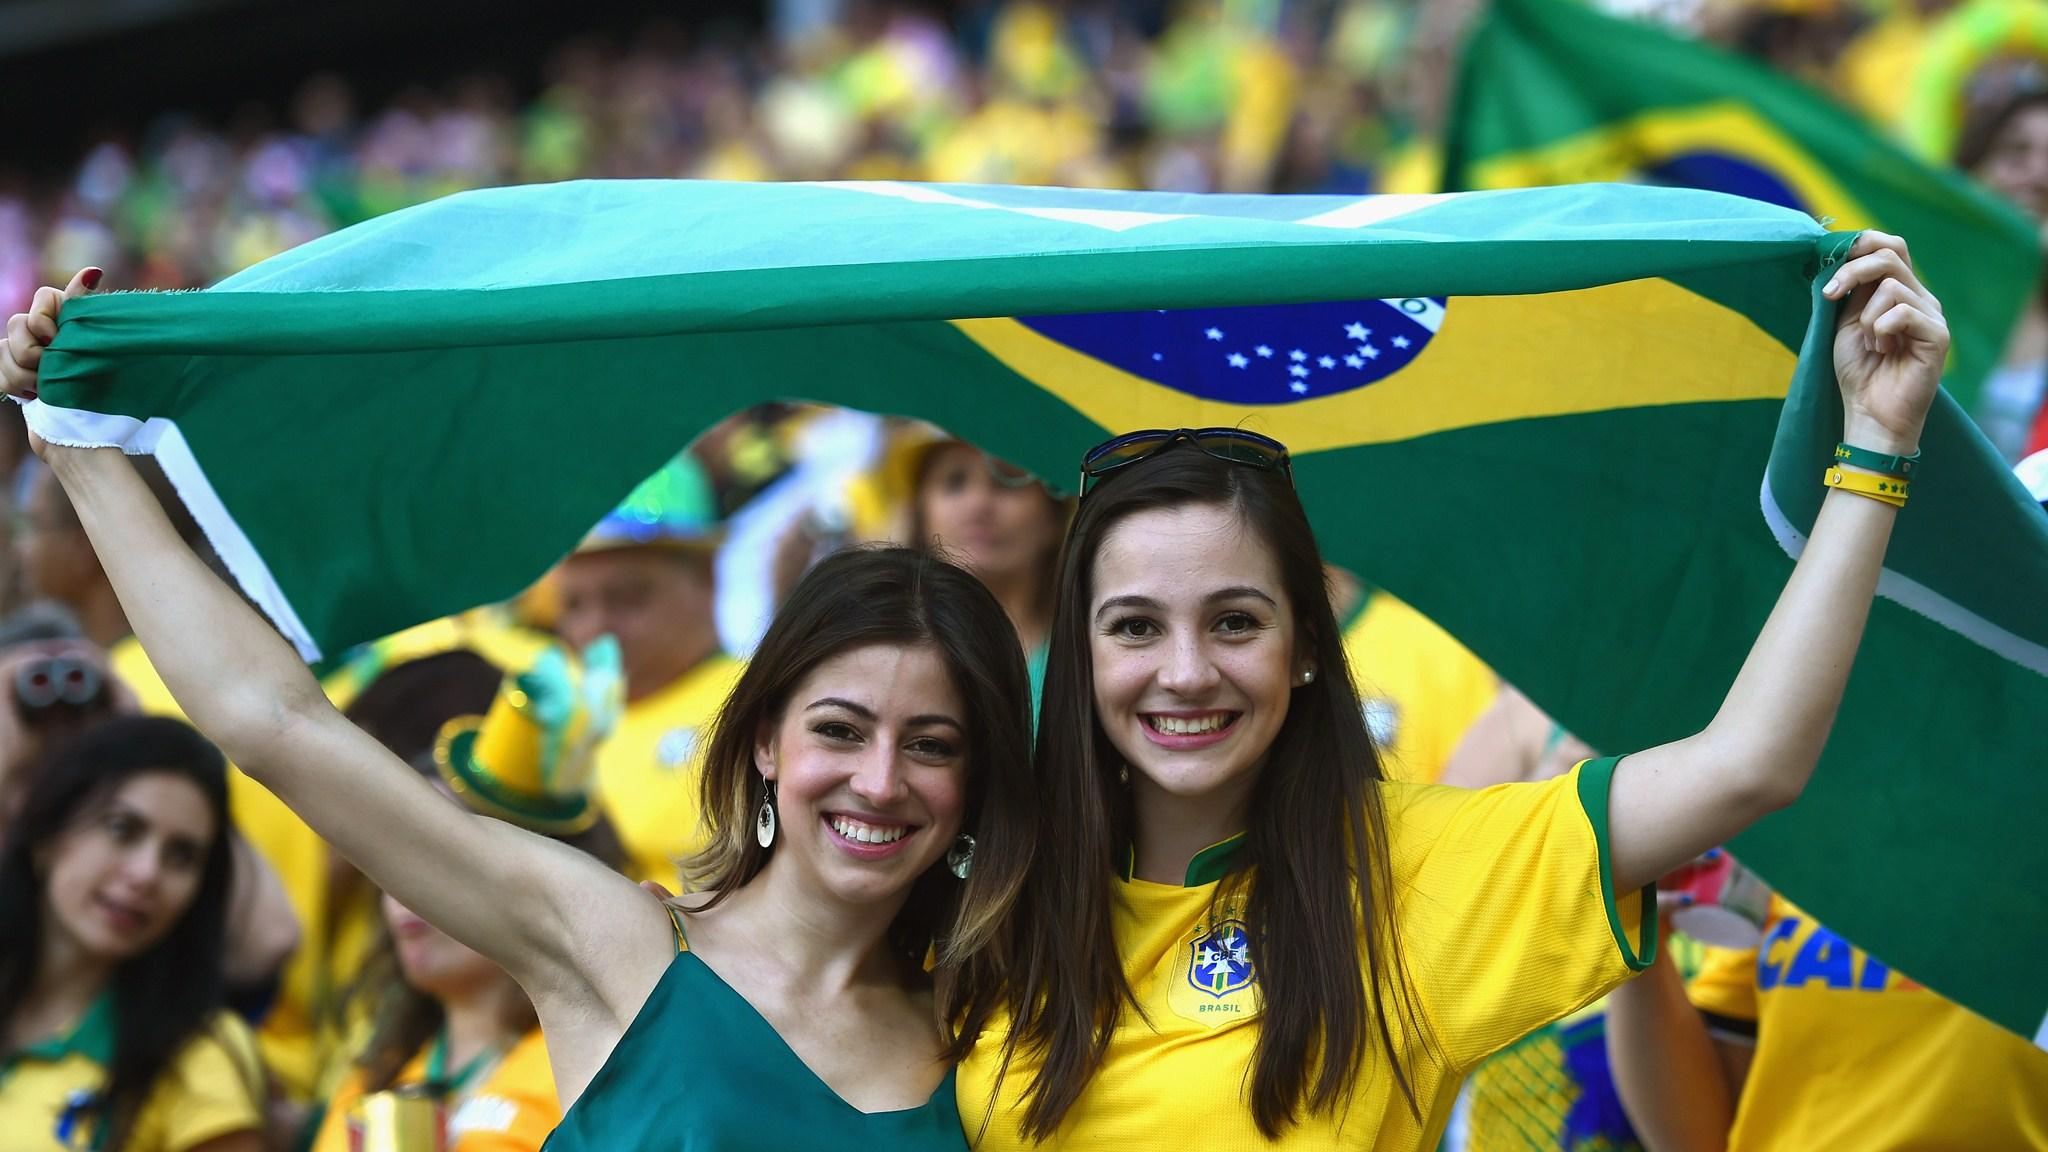 194 - Brazil-Croatia [3-1] -- 12 Jun 2014 - 17-00 -- Sao Paulo - Arena Corinthians - kuaza